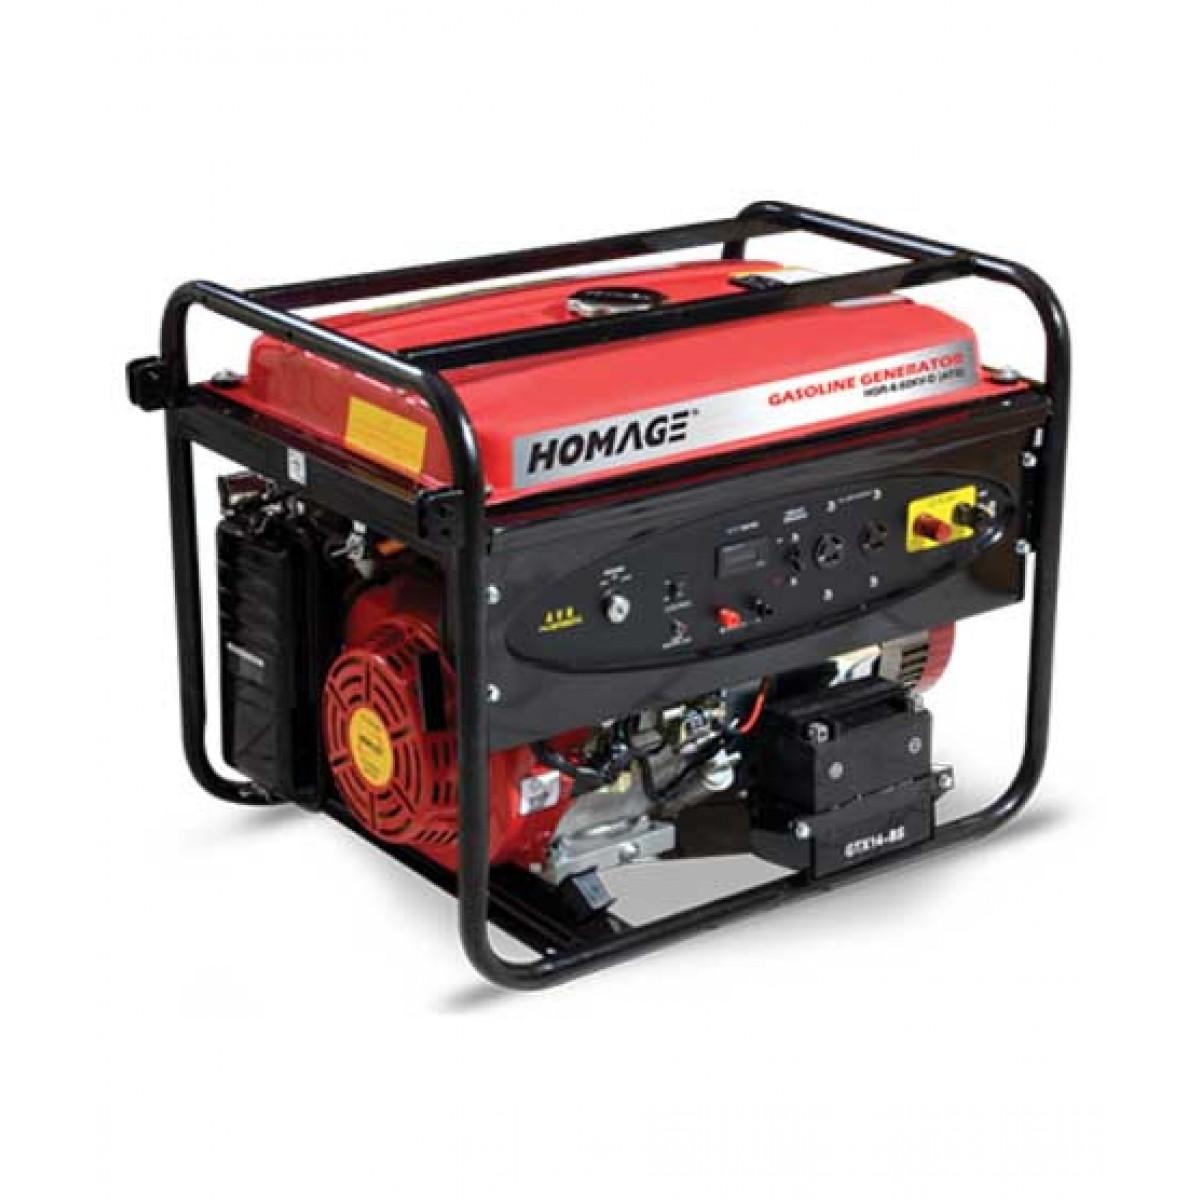 Homage Generator ATS With Wheel+Gas Kit+Oil (HGR-6.02 KV-D)